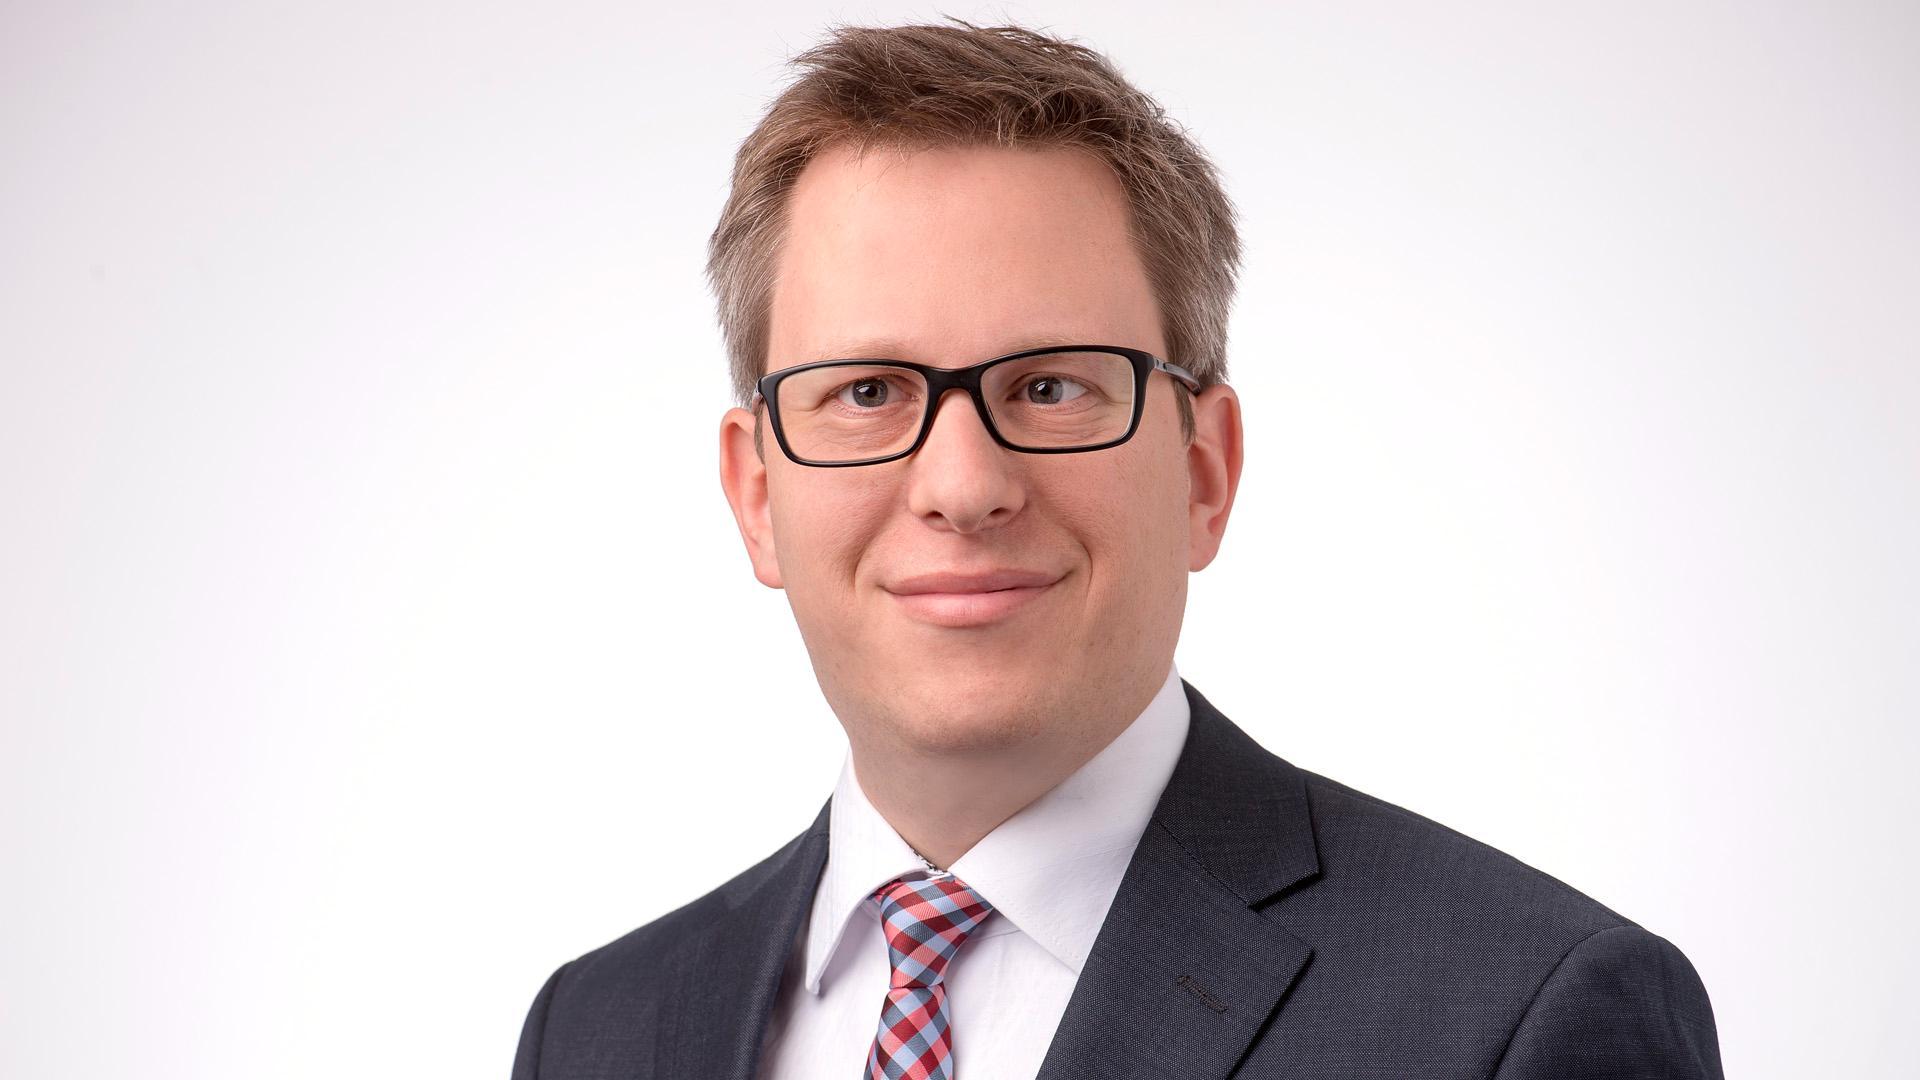 Tobias Alexander Lutz